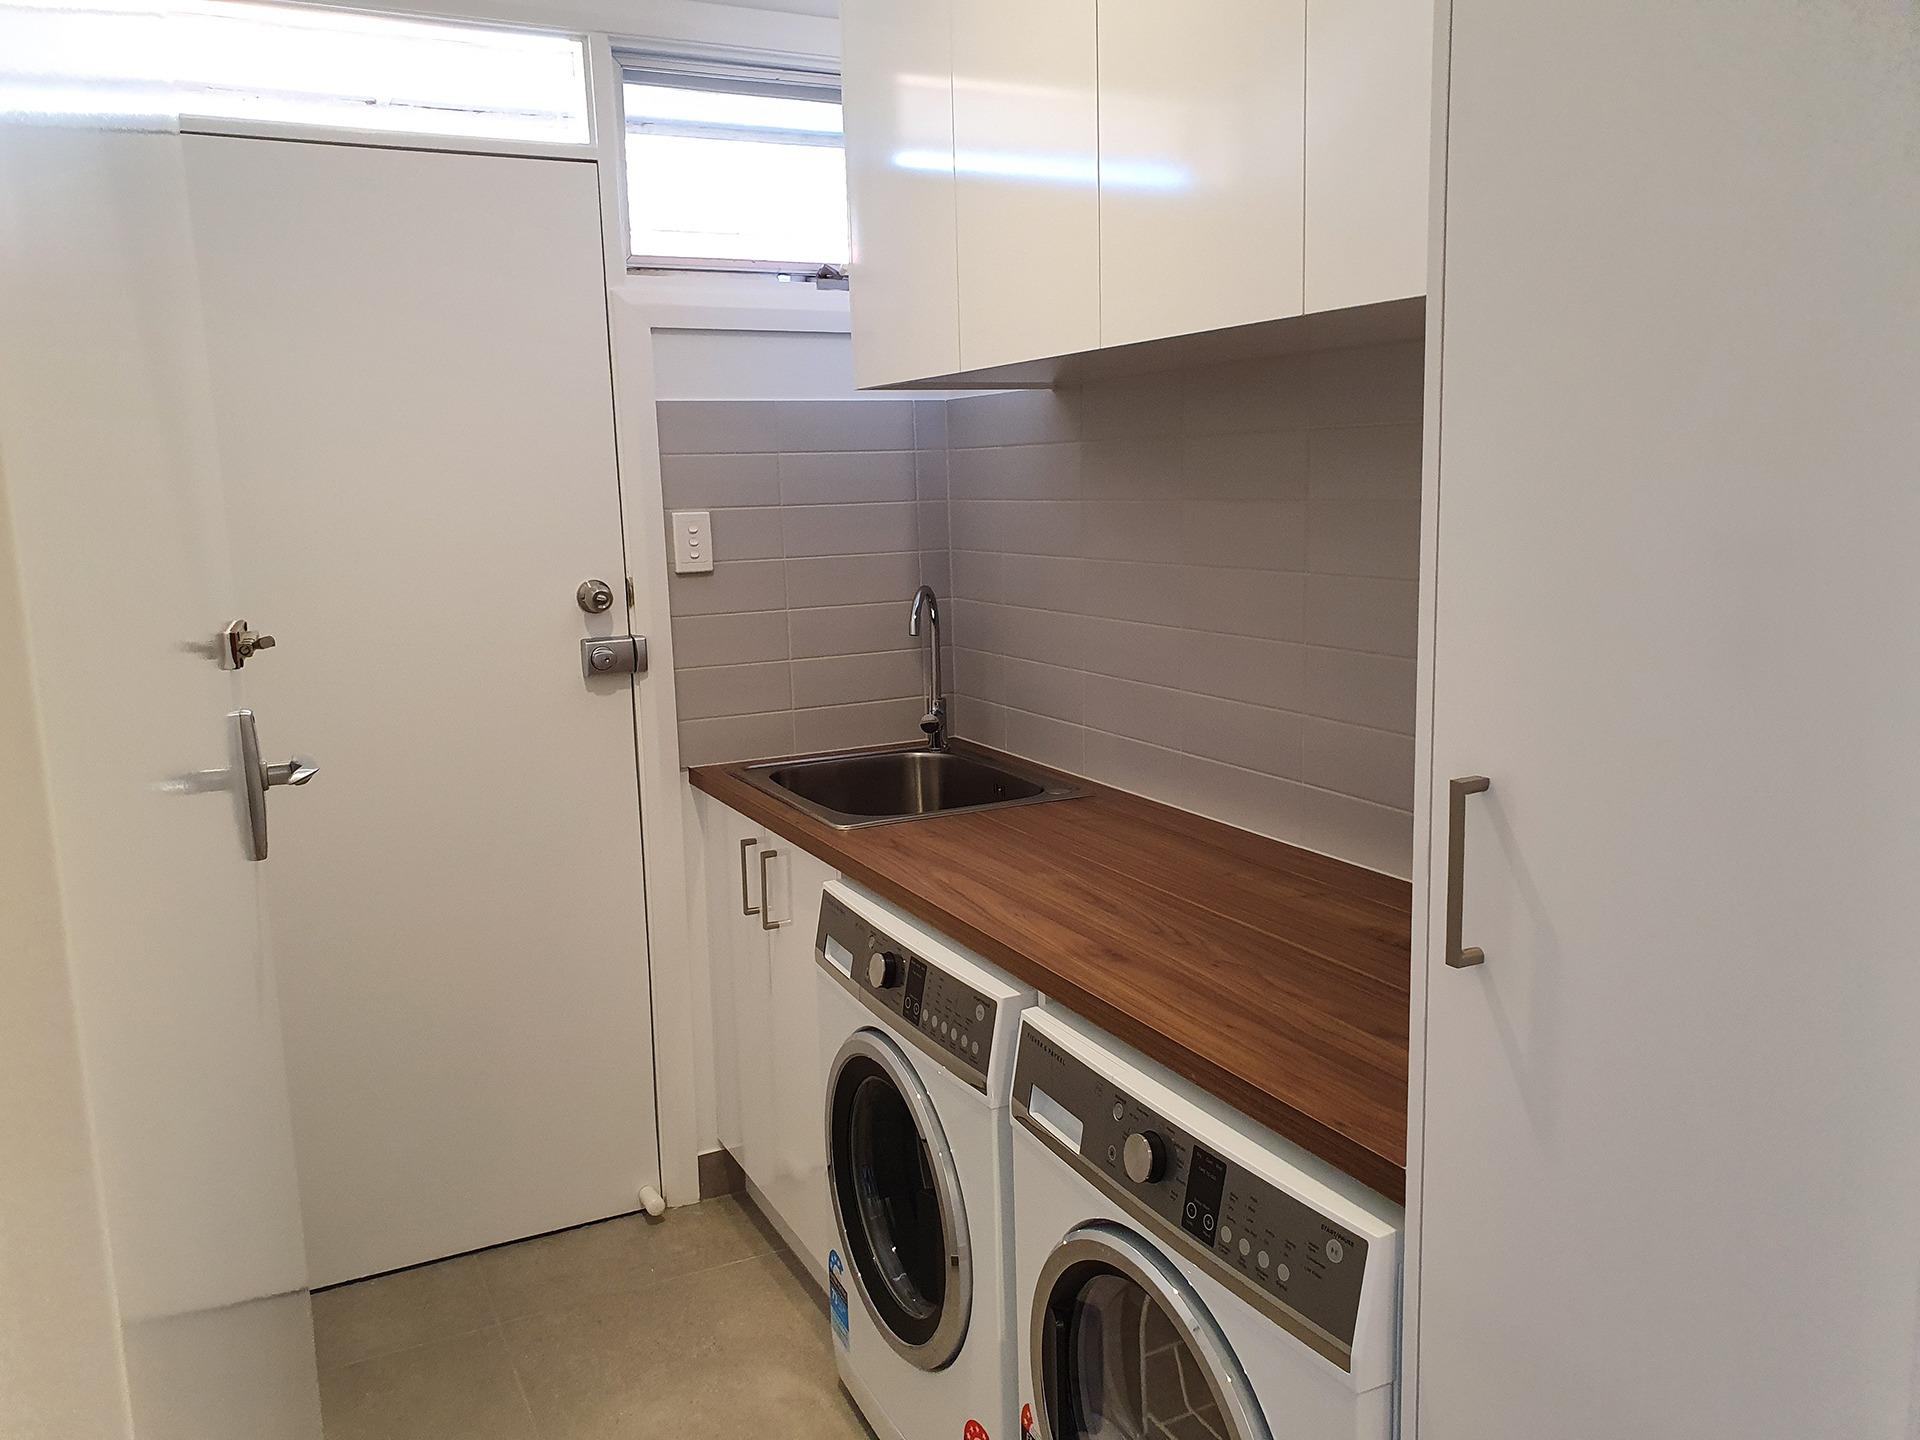 Sink & Laundry Renovations - Bayview Renovations